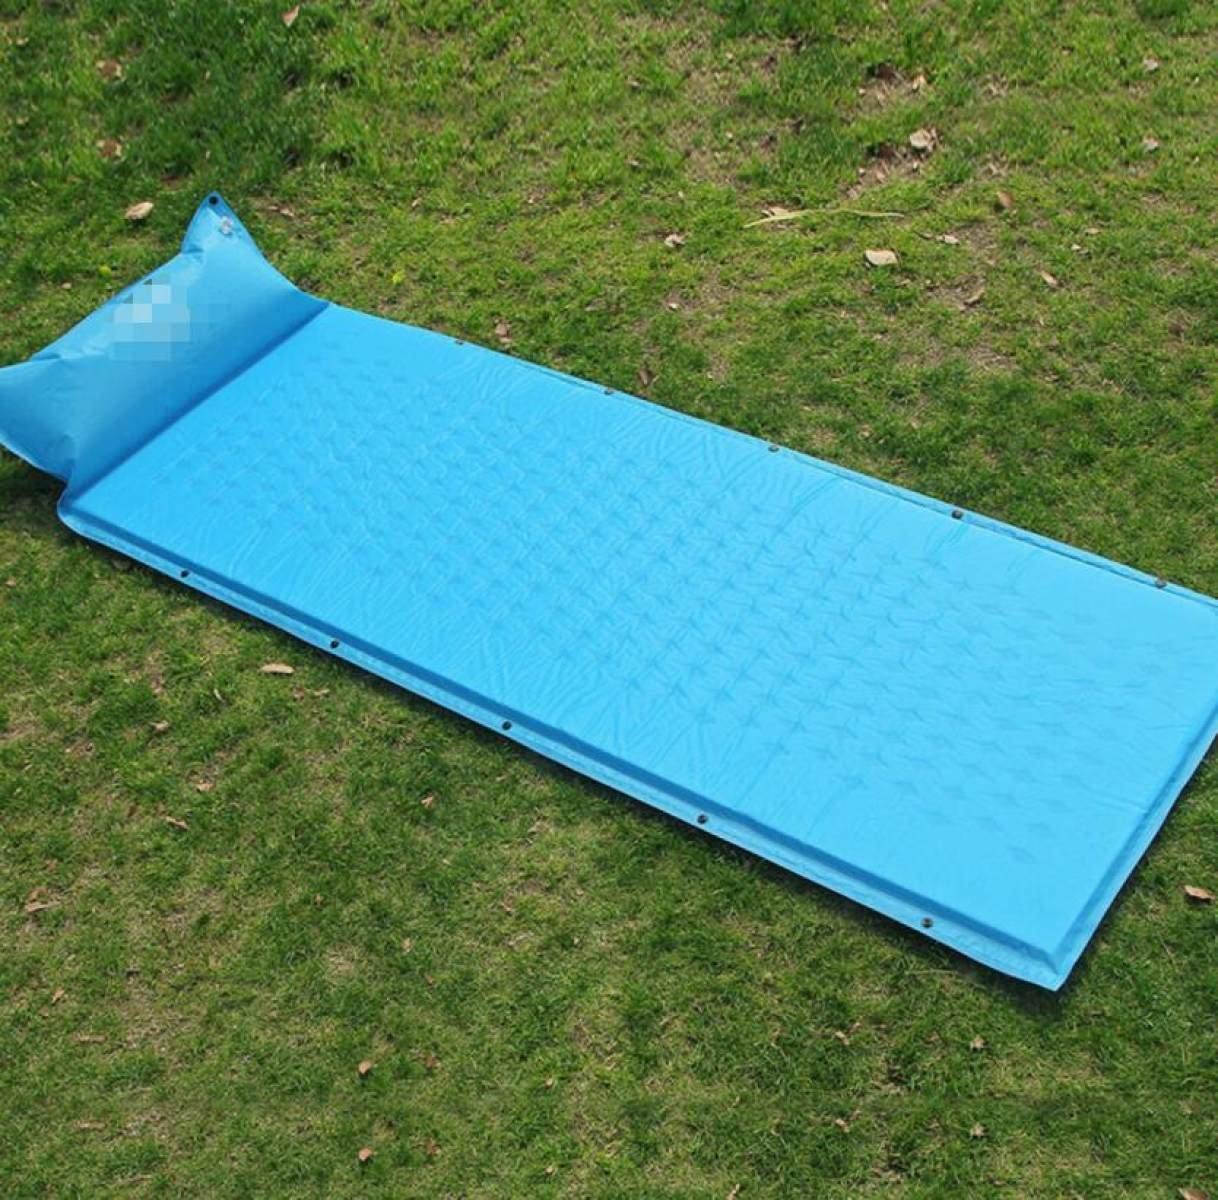 Outdoor Single Mit Kissen Kann Genäht Feuchtigkeitsfeste Pad Camping Sleeping Pad Automatische Aufblasbare Pad,A2